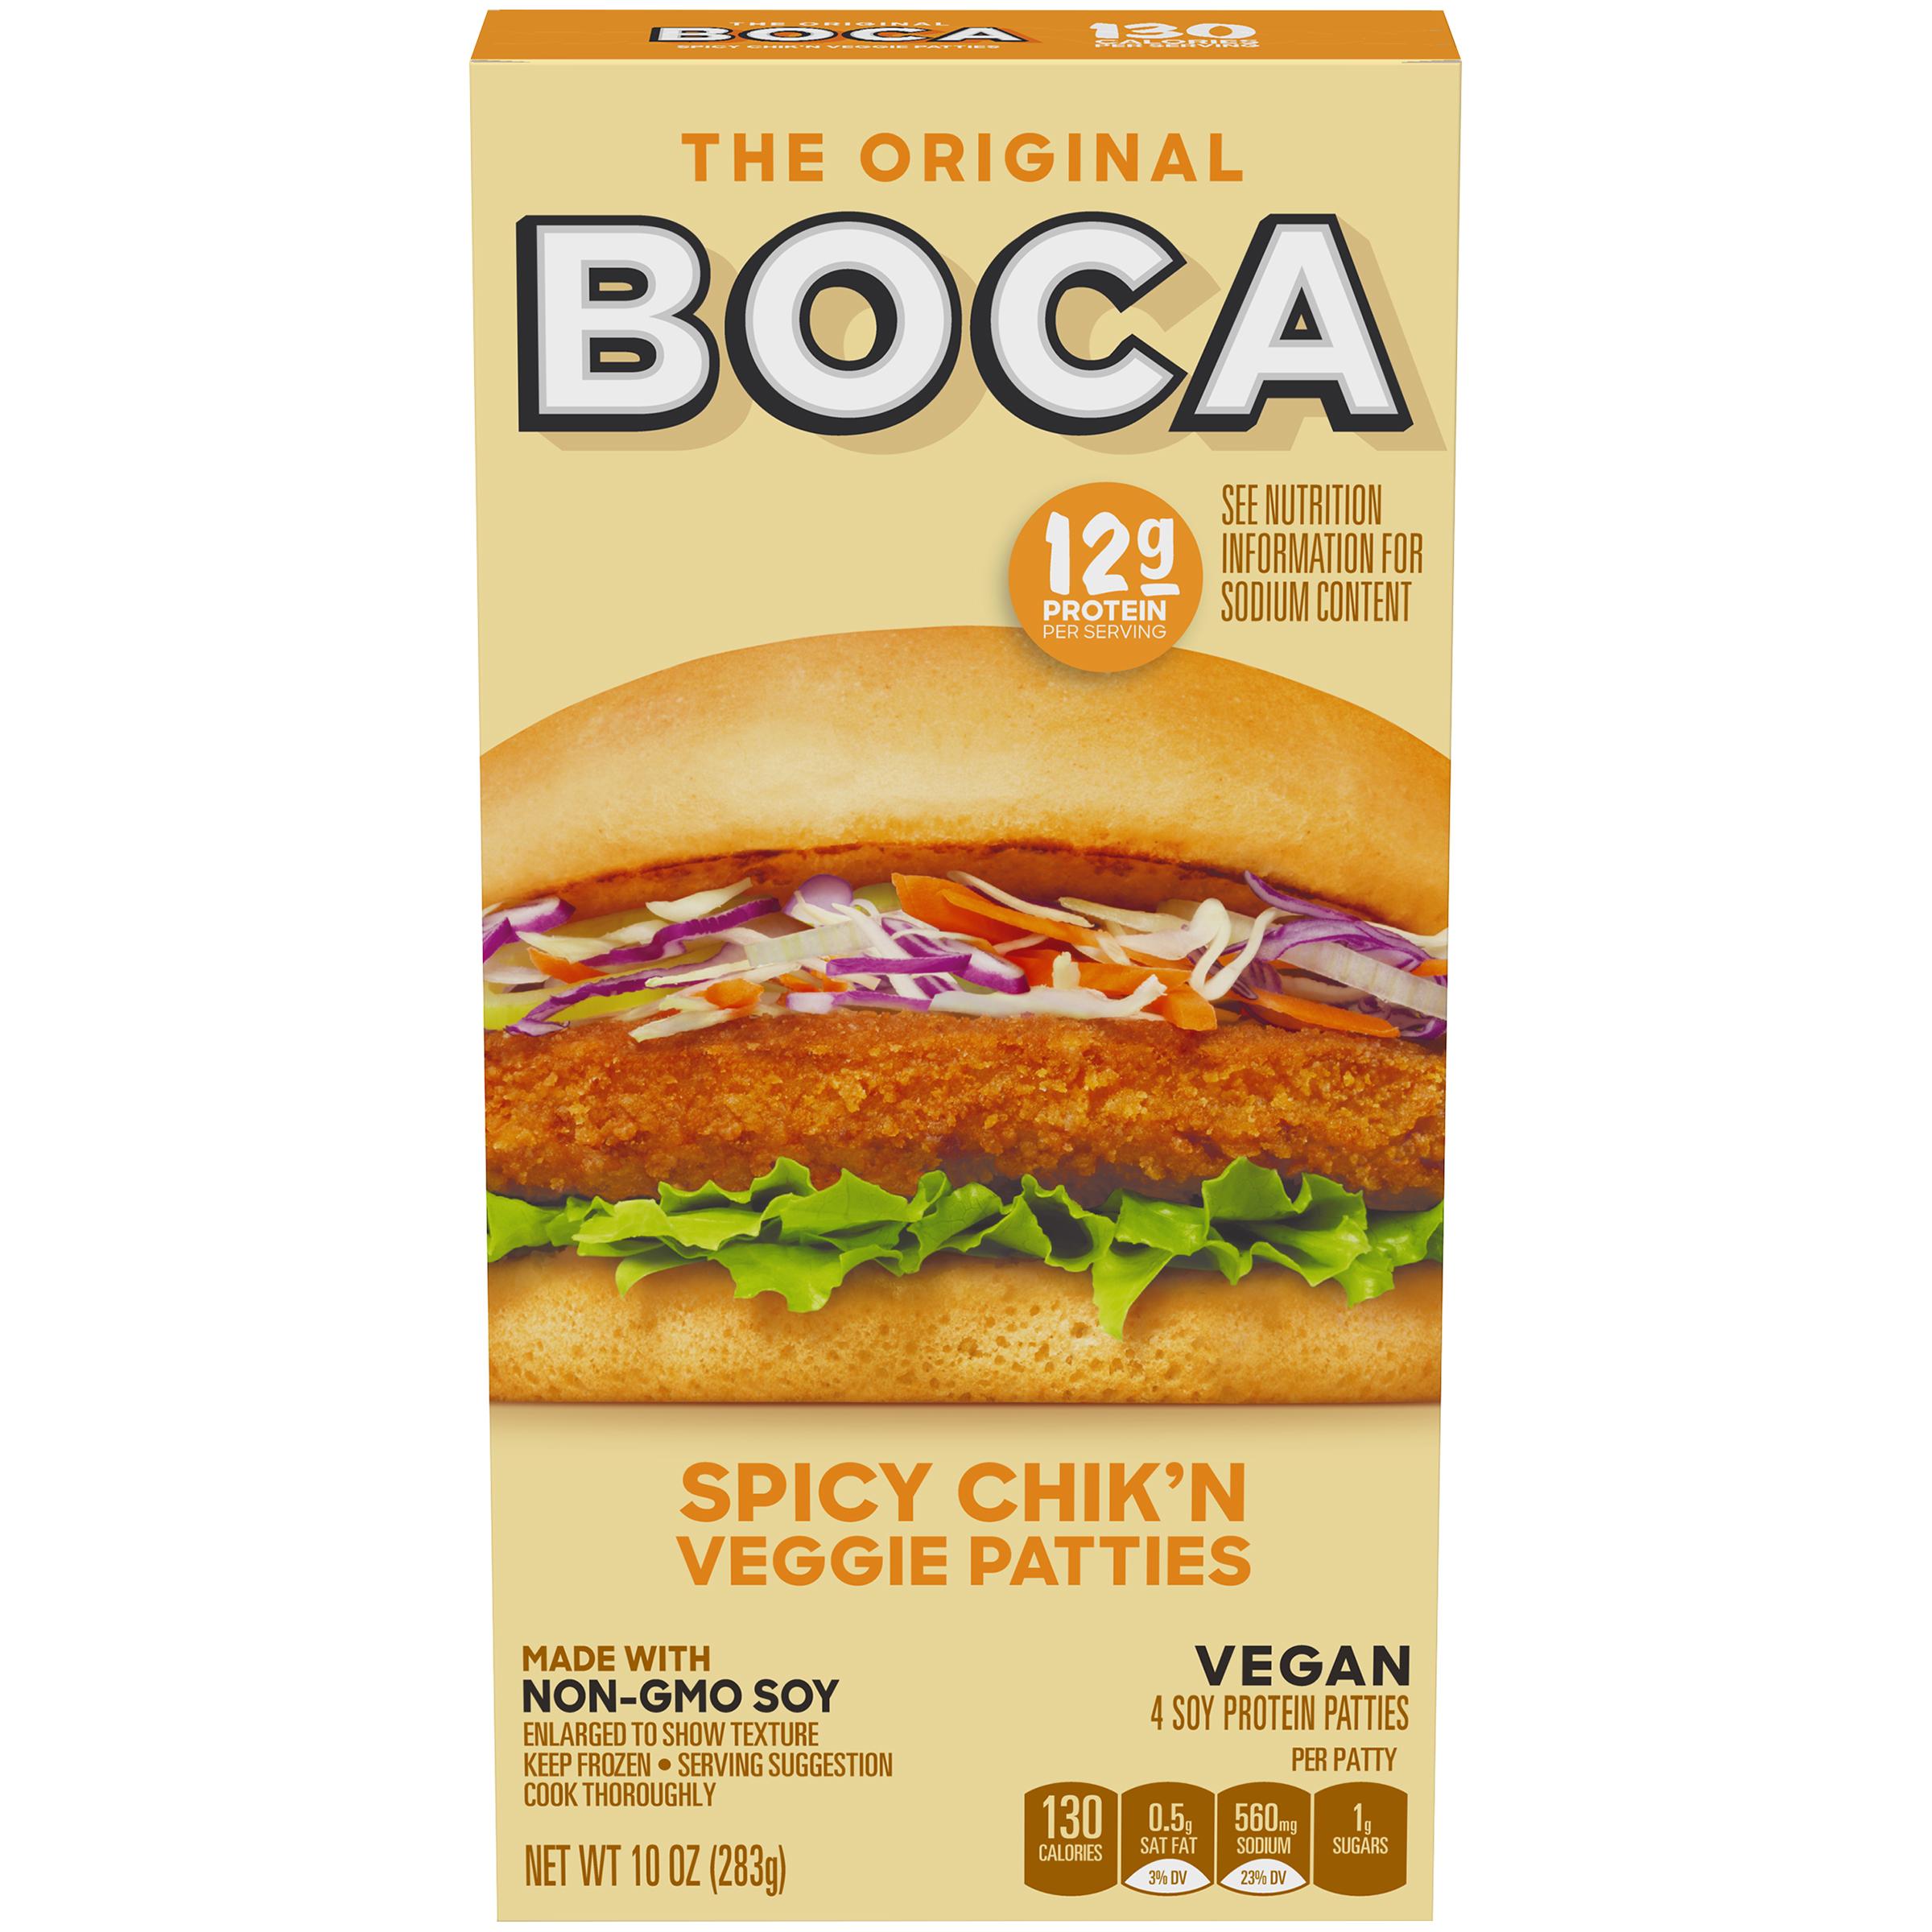 Boca Spicy Chikn Vegan Patties